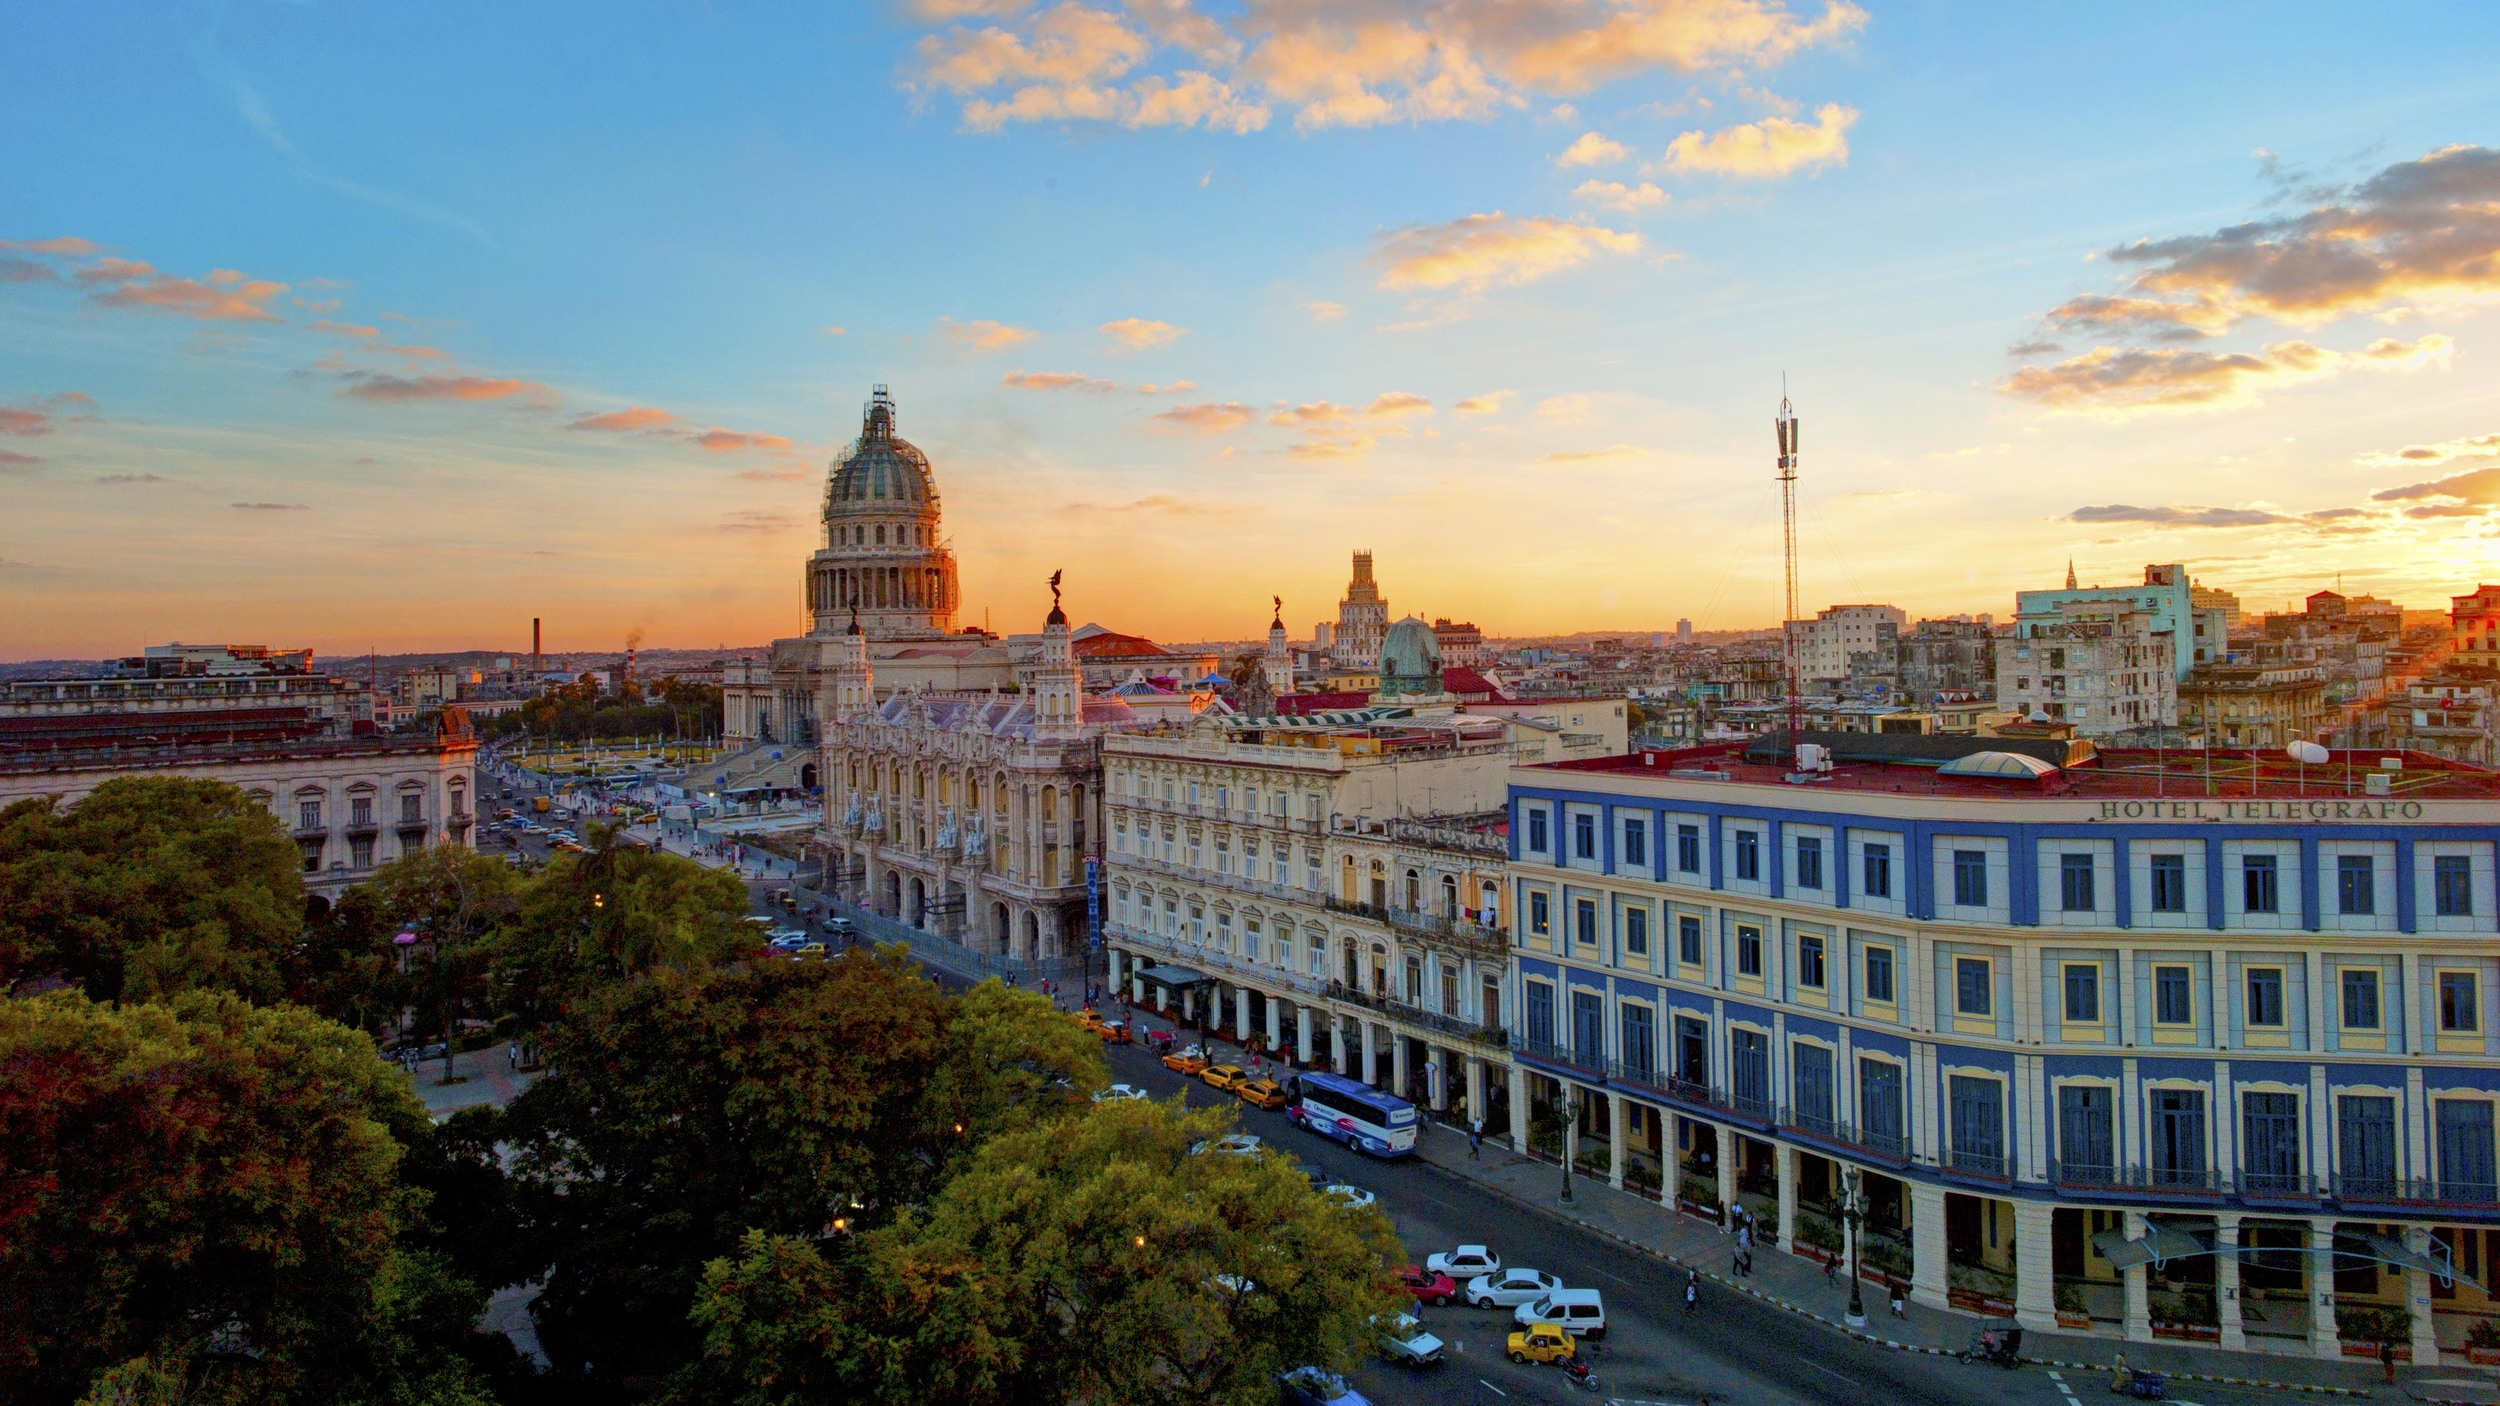 Cuba 2014 0003final.jpg